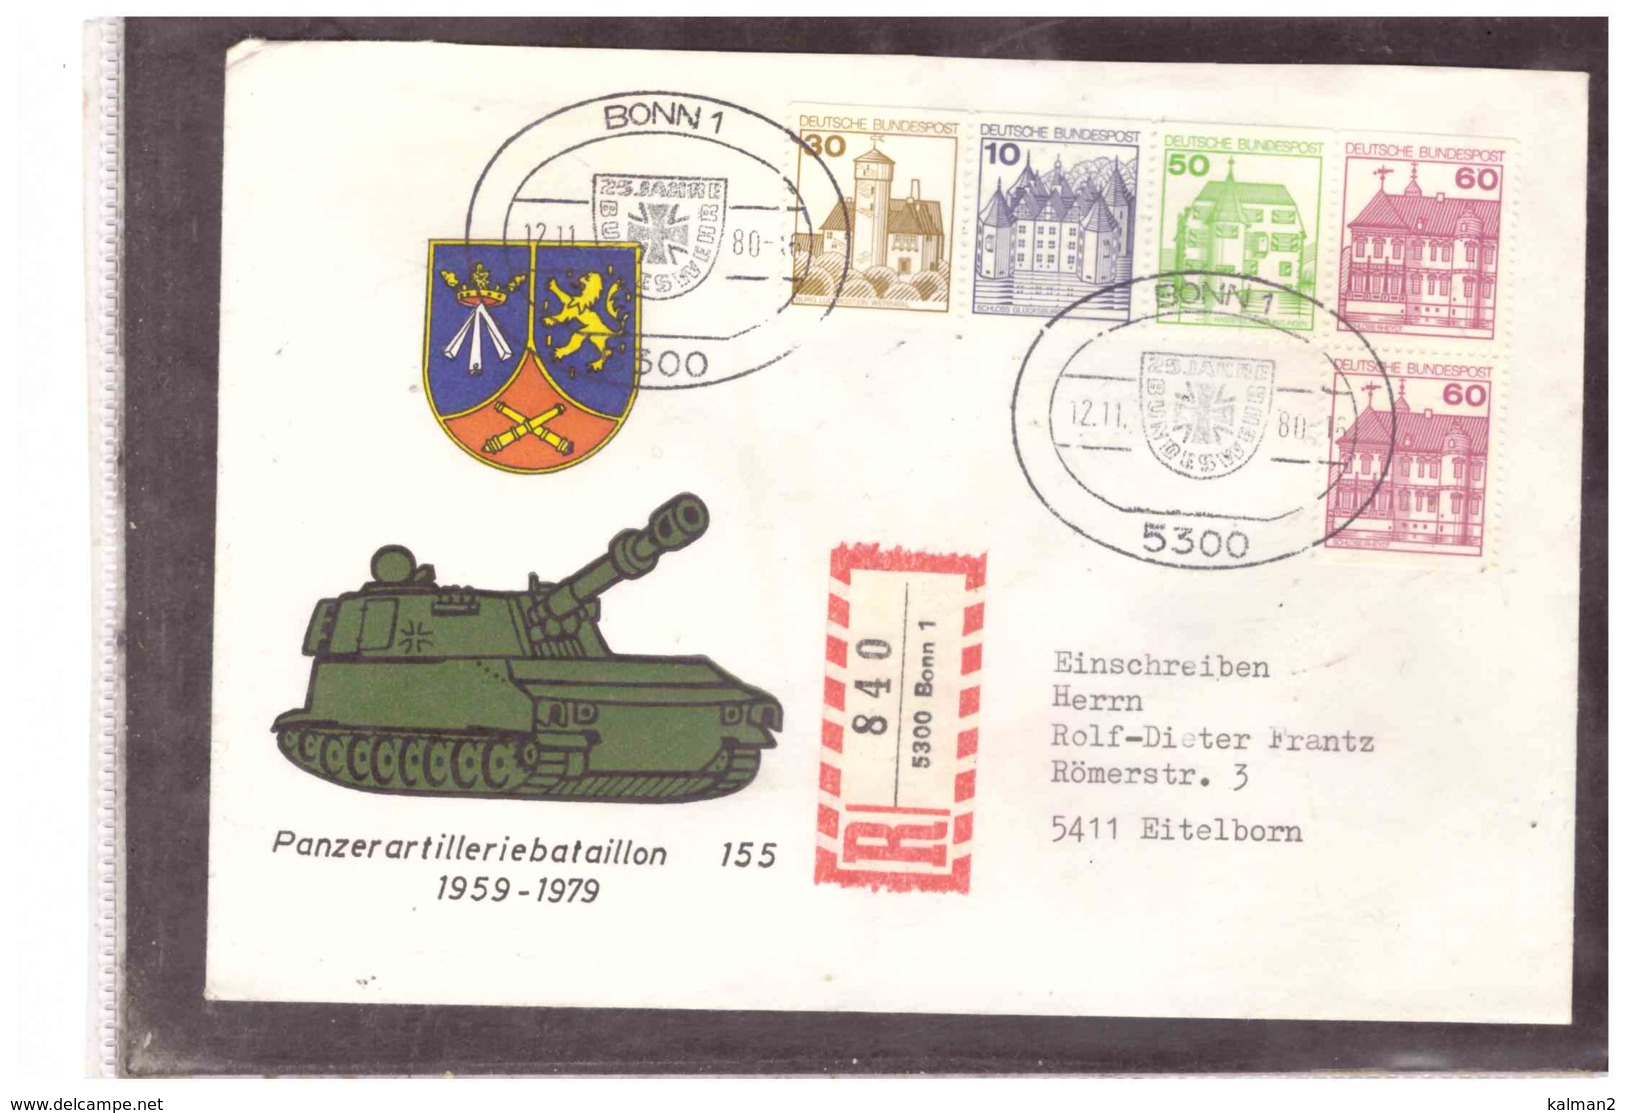 DE2255   -   BONN  12.11.1980      /     25 JAHRE BUNDESWEHR - Militaria